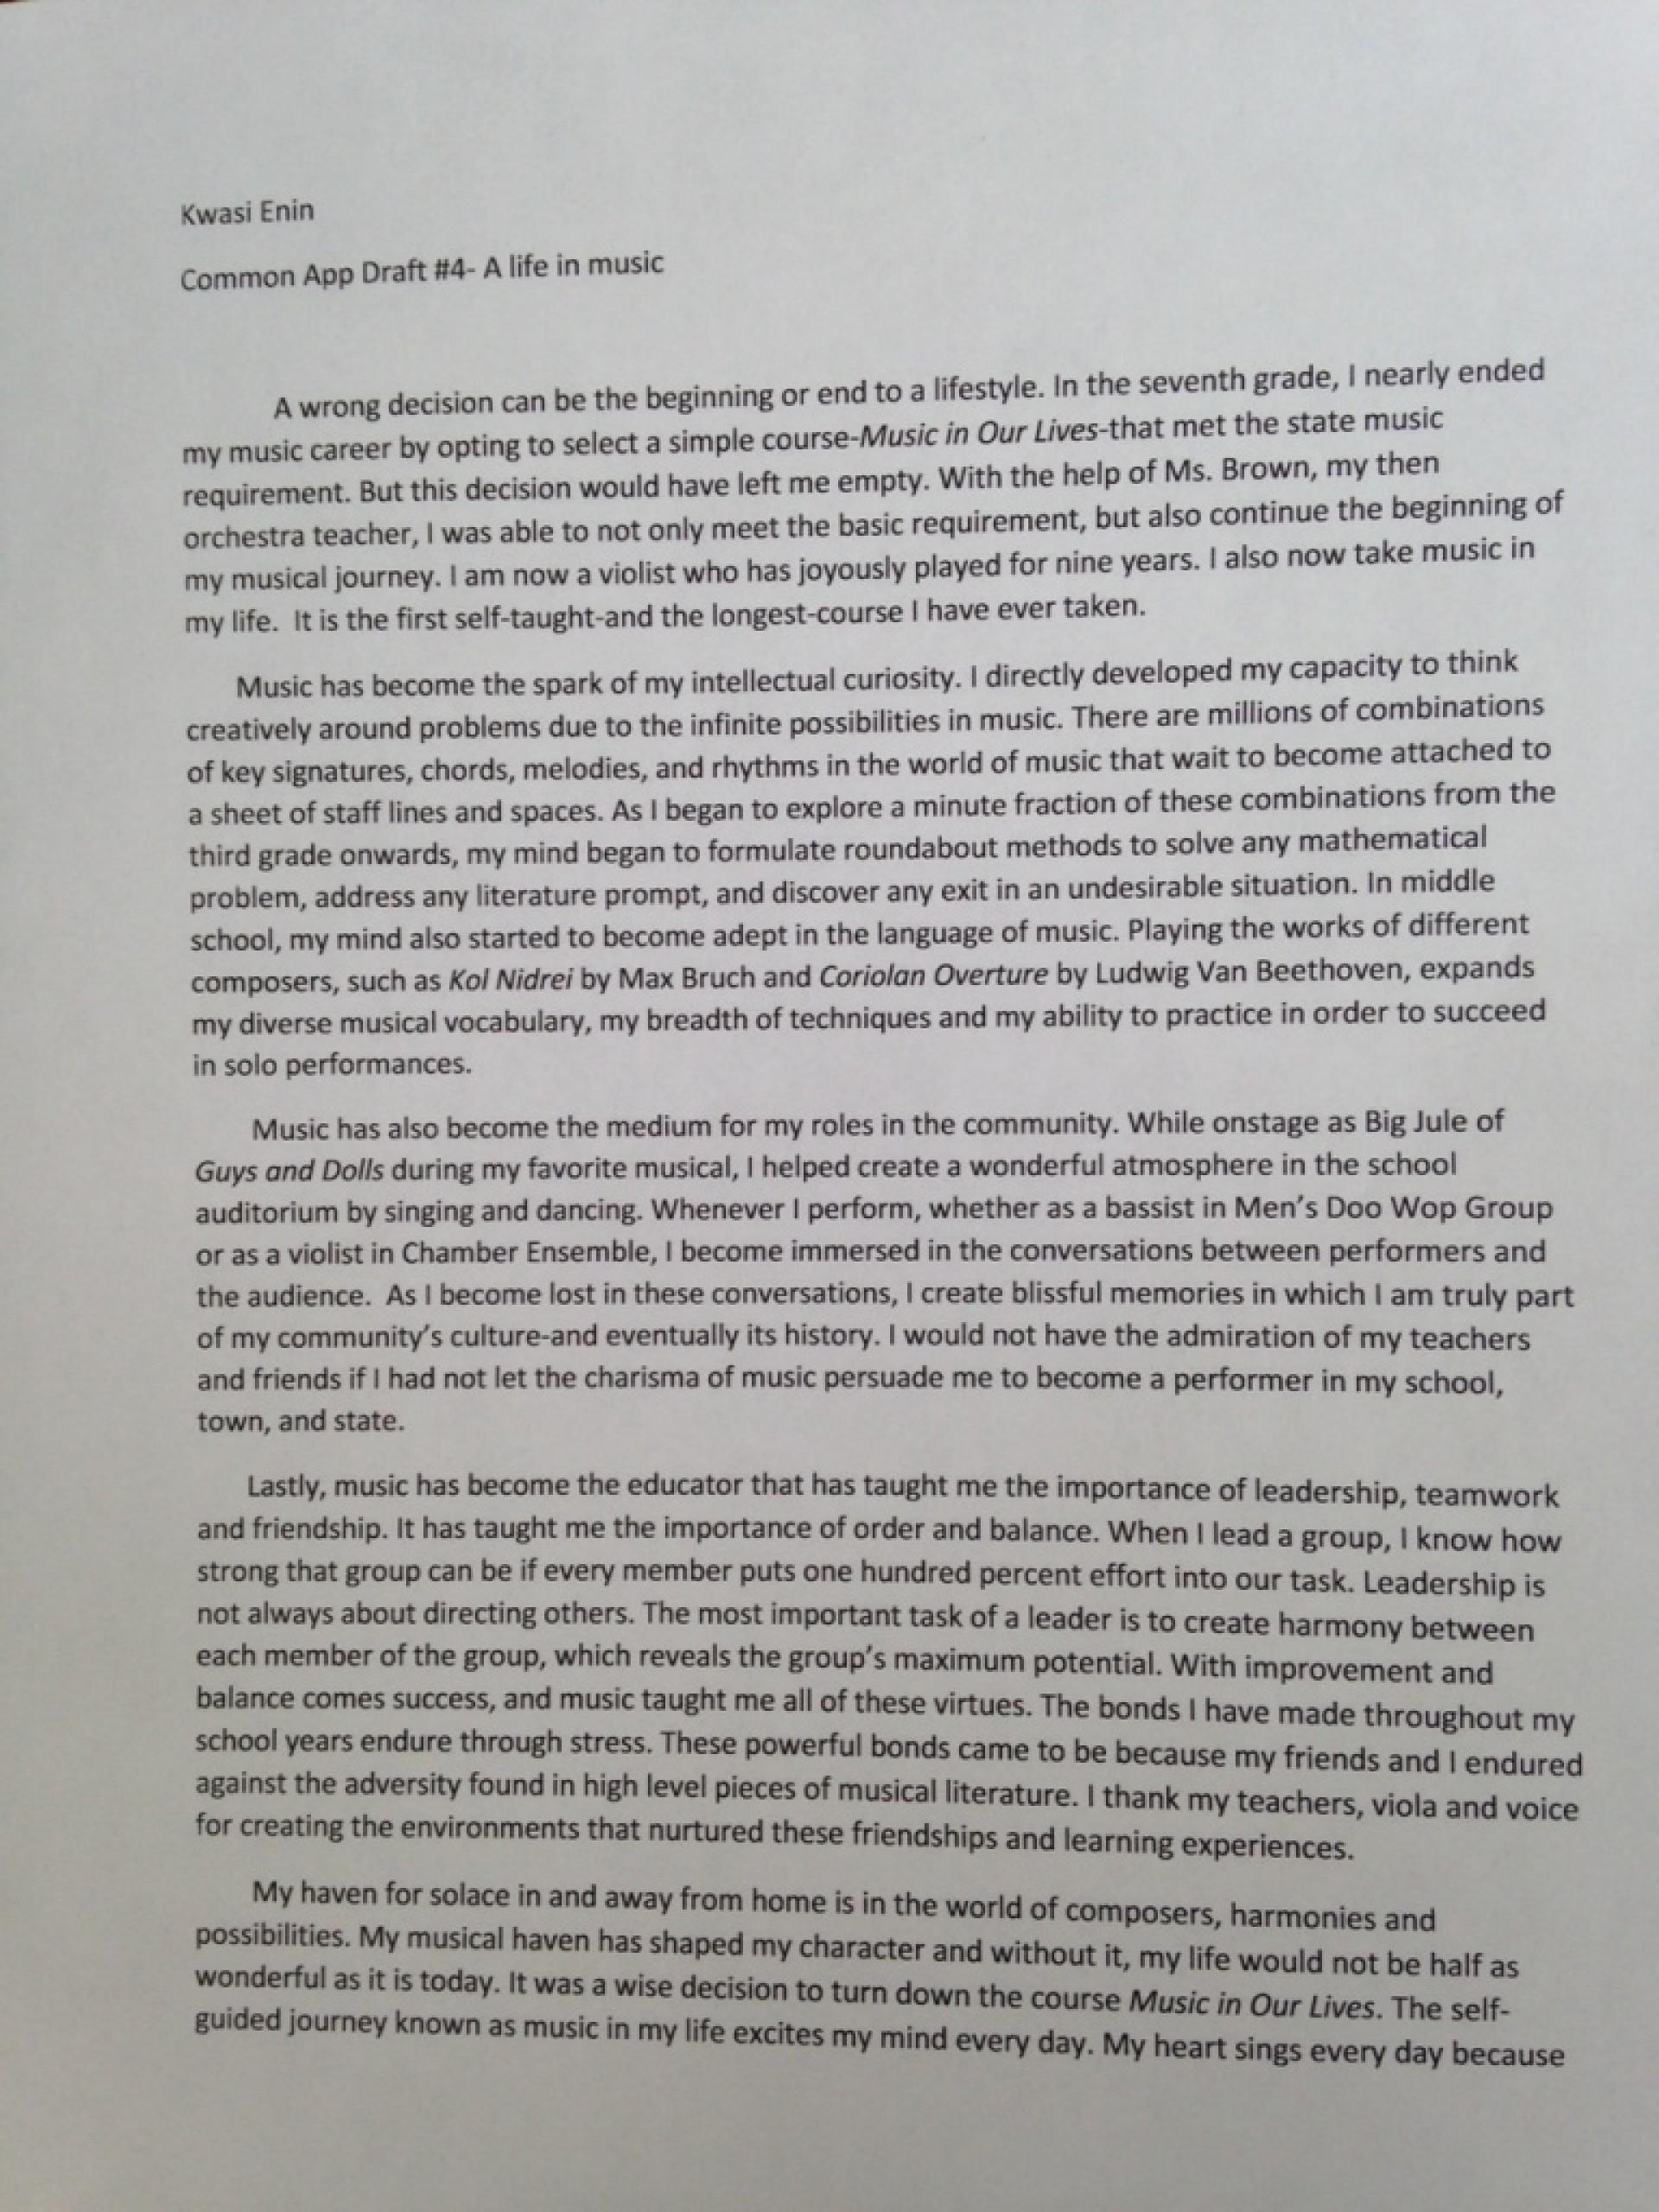 003 Kwasi Enin S College Essay Conversion Gate02 Thumbnail Ivy League Essays Singular Tips Topics Help 1920